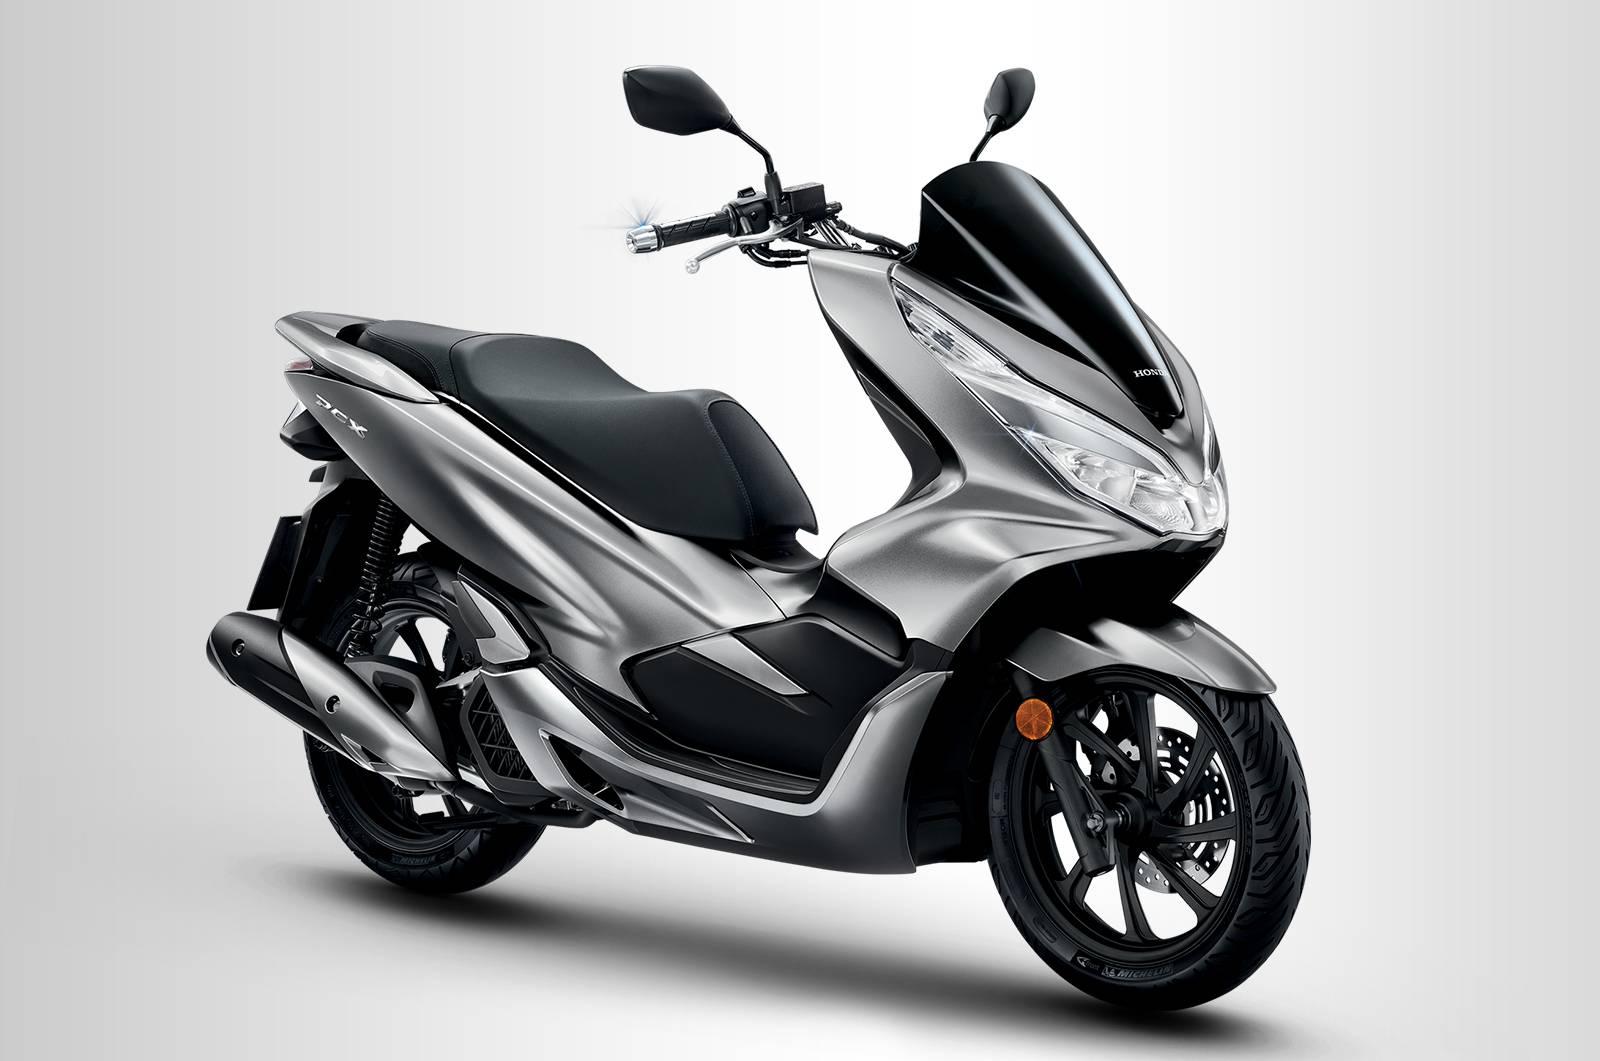 Ficha técnica da Honda PCX 150 2013 a 2022